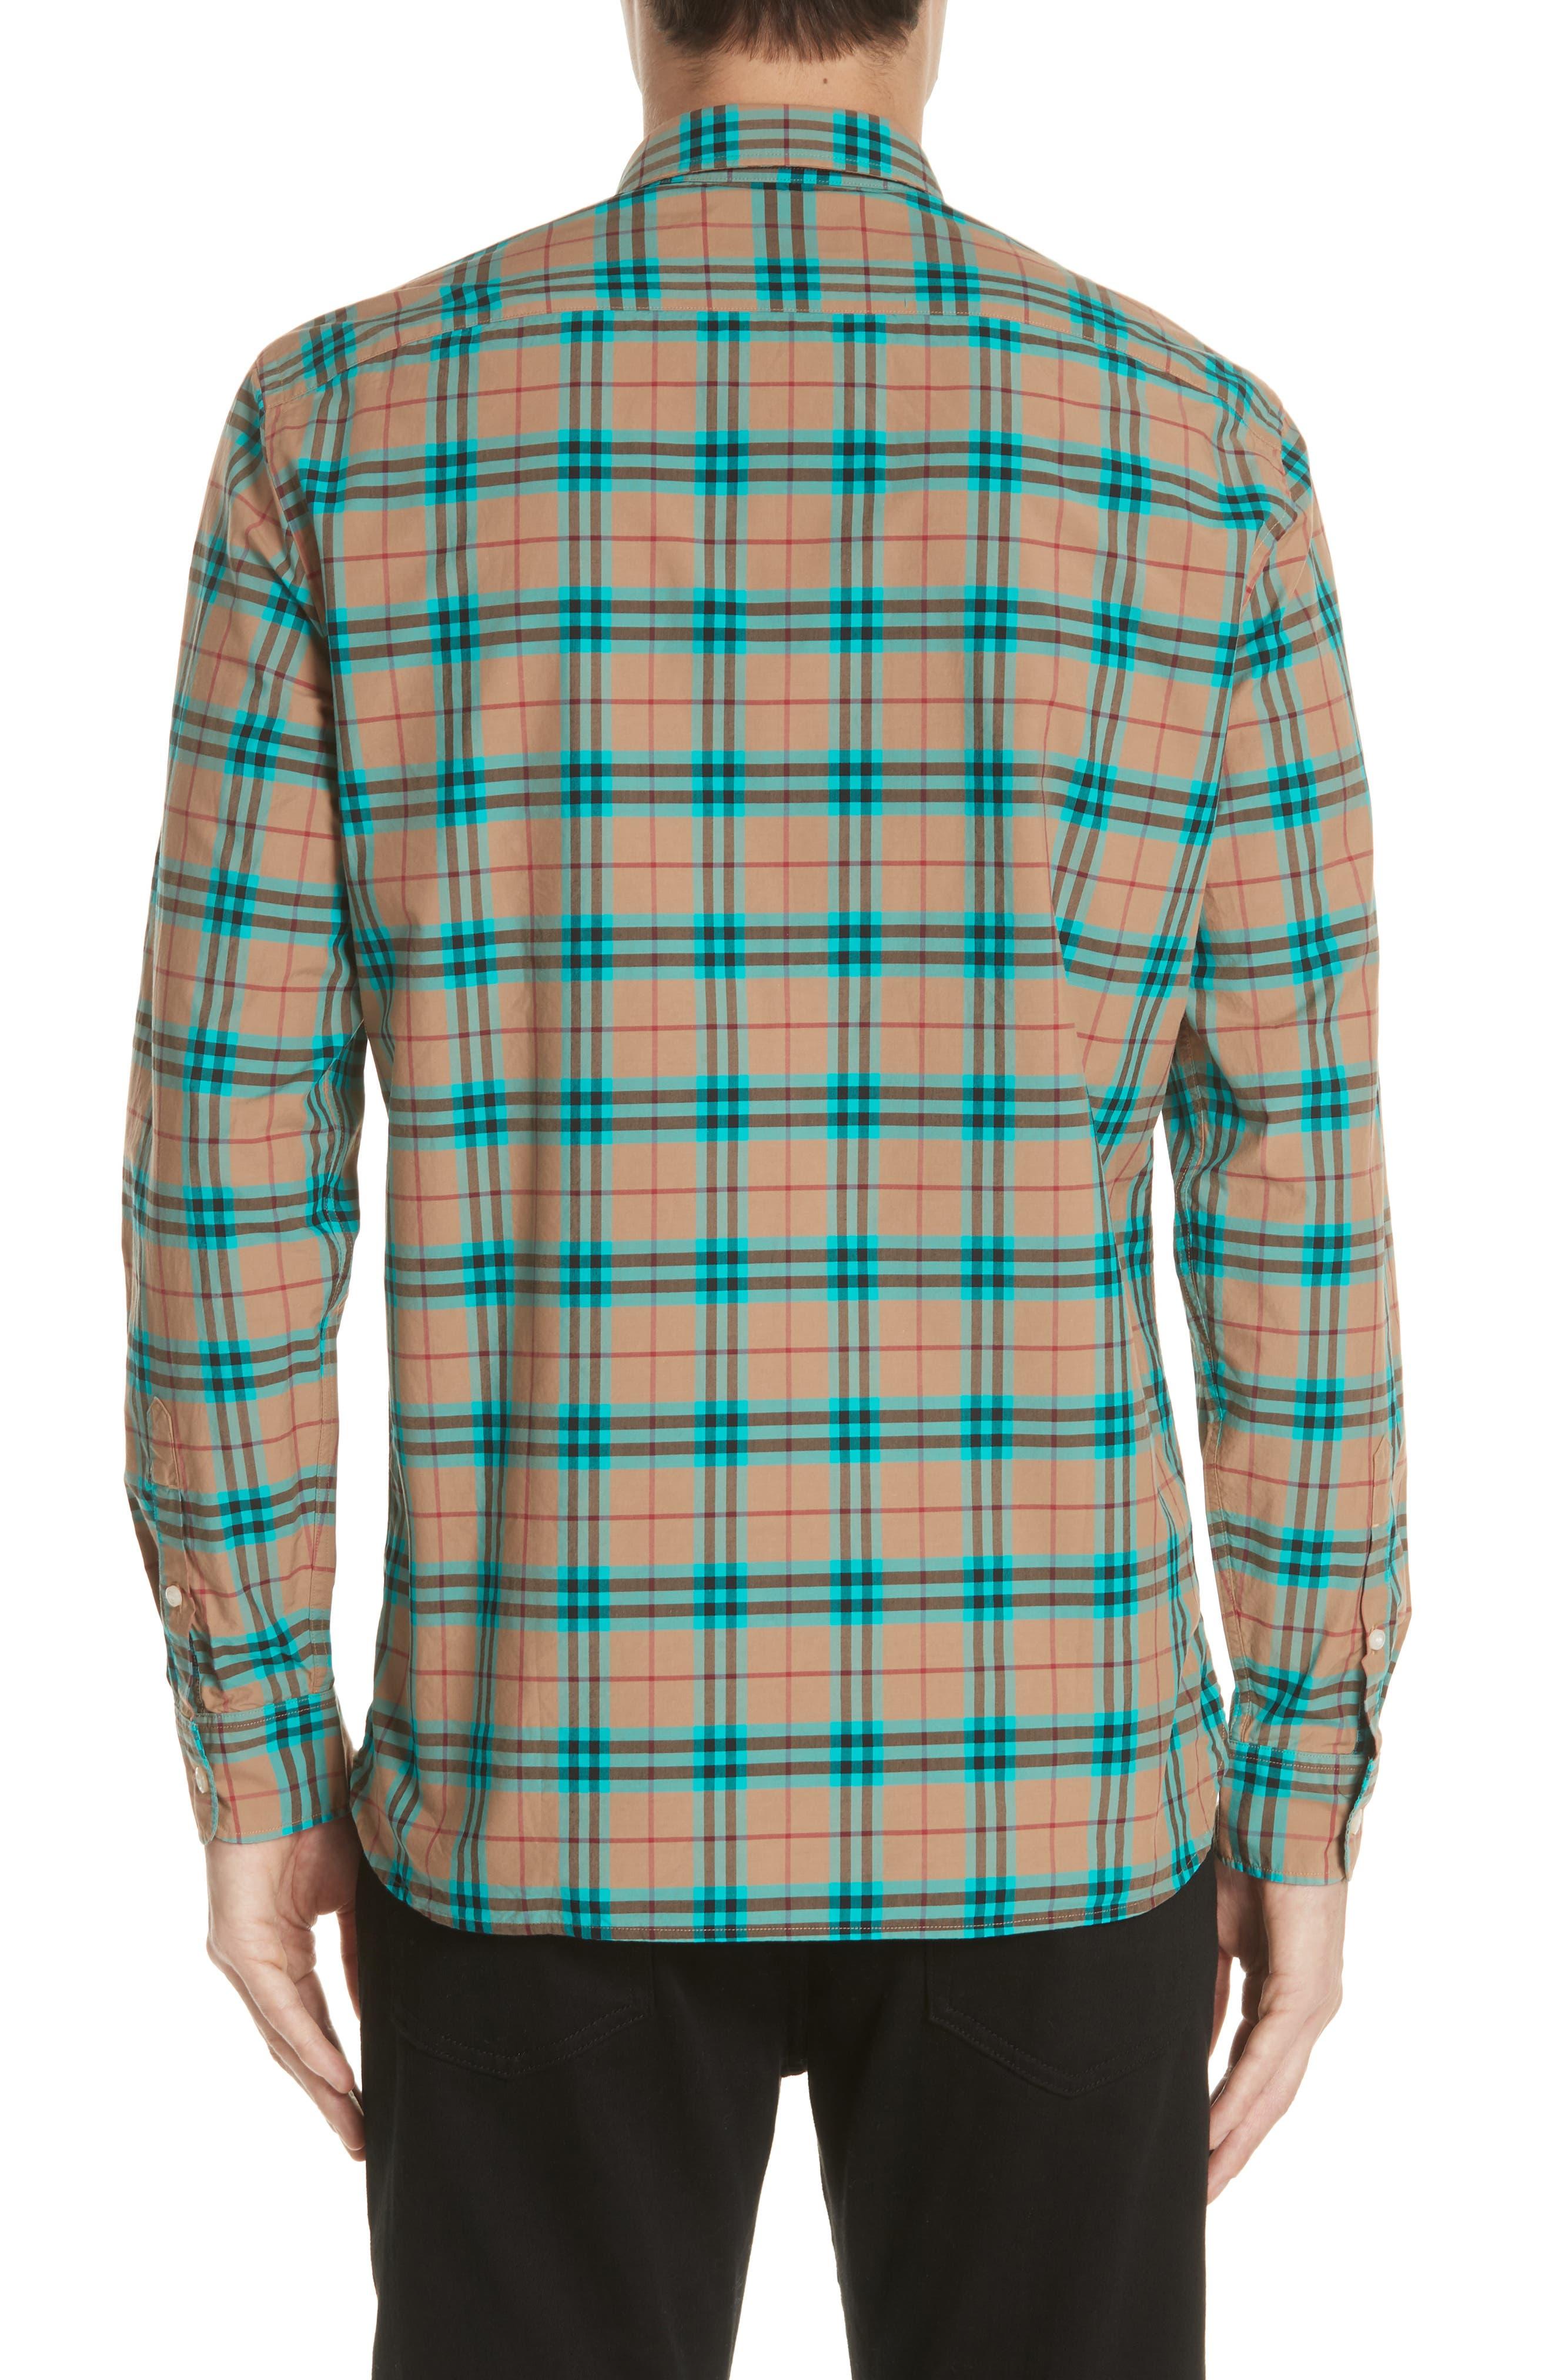 Alexander Check Sport Shirt,                             Alternate thumbnail 3, color,                             Aqua Green